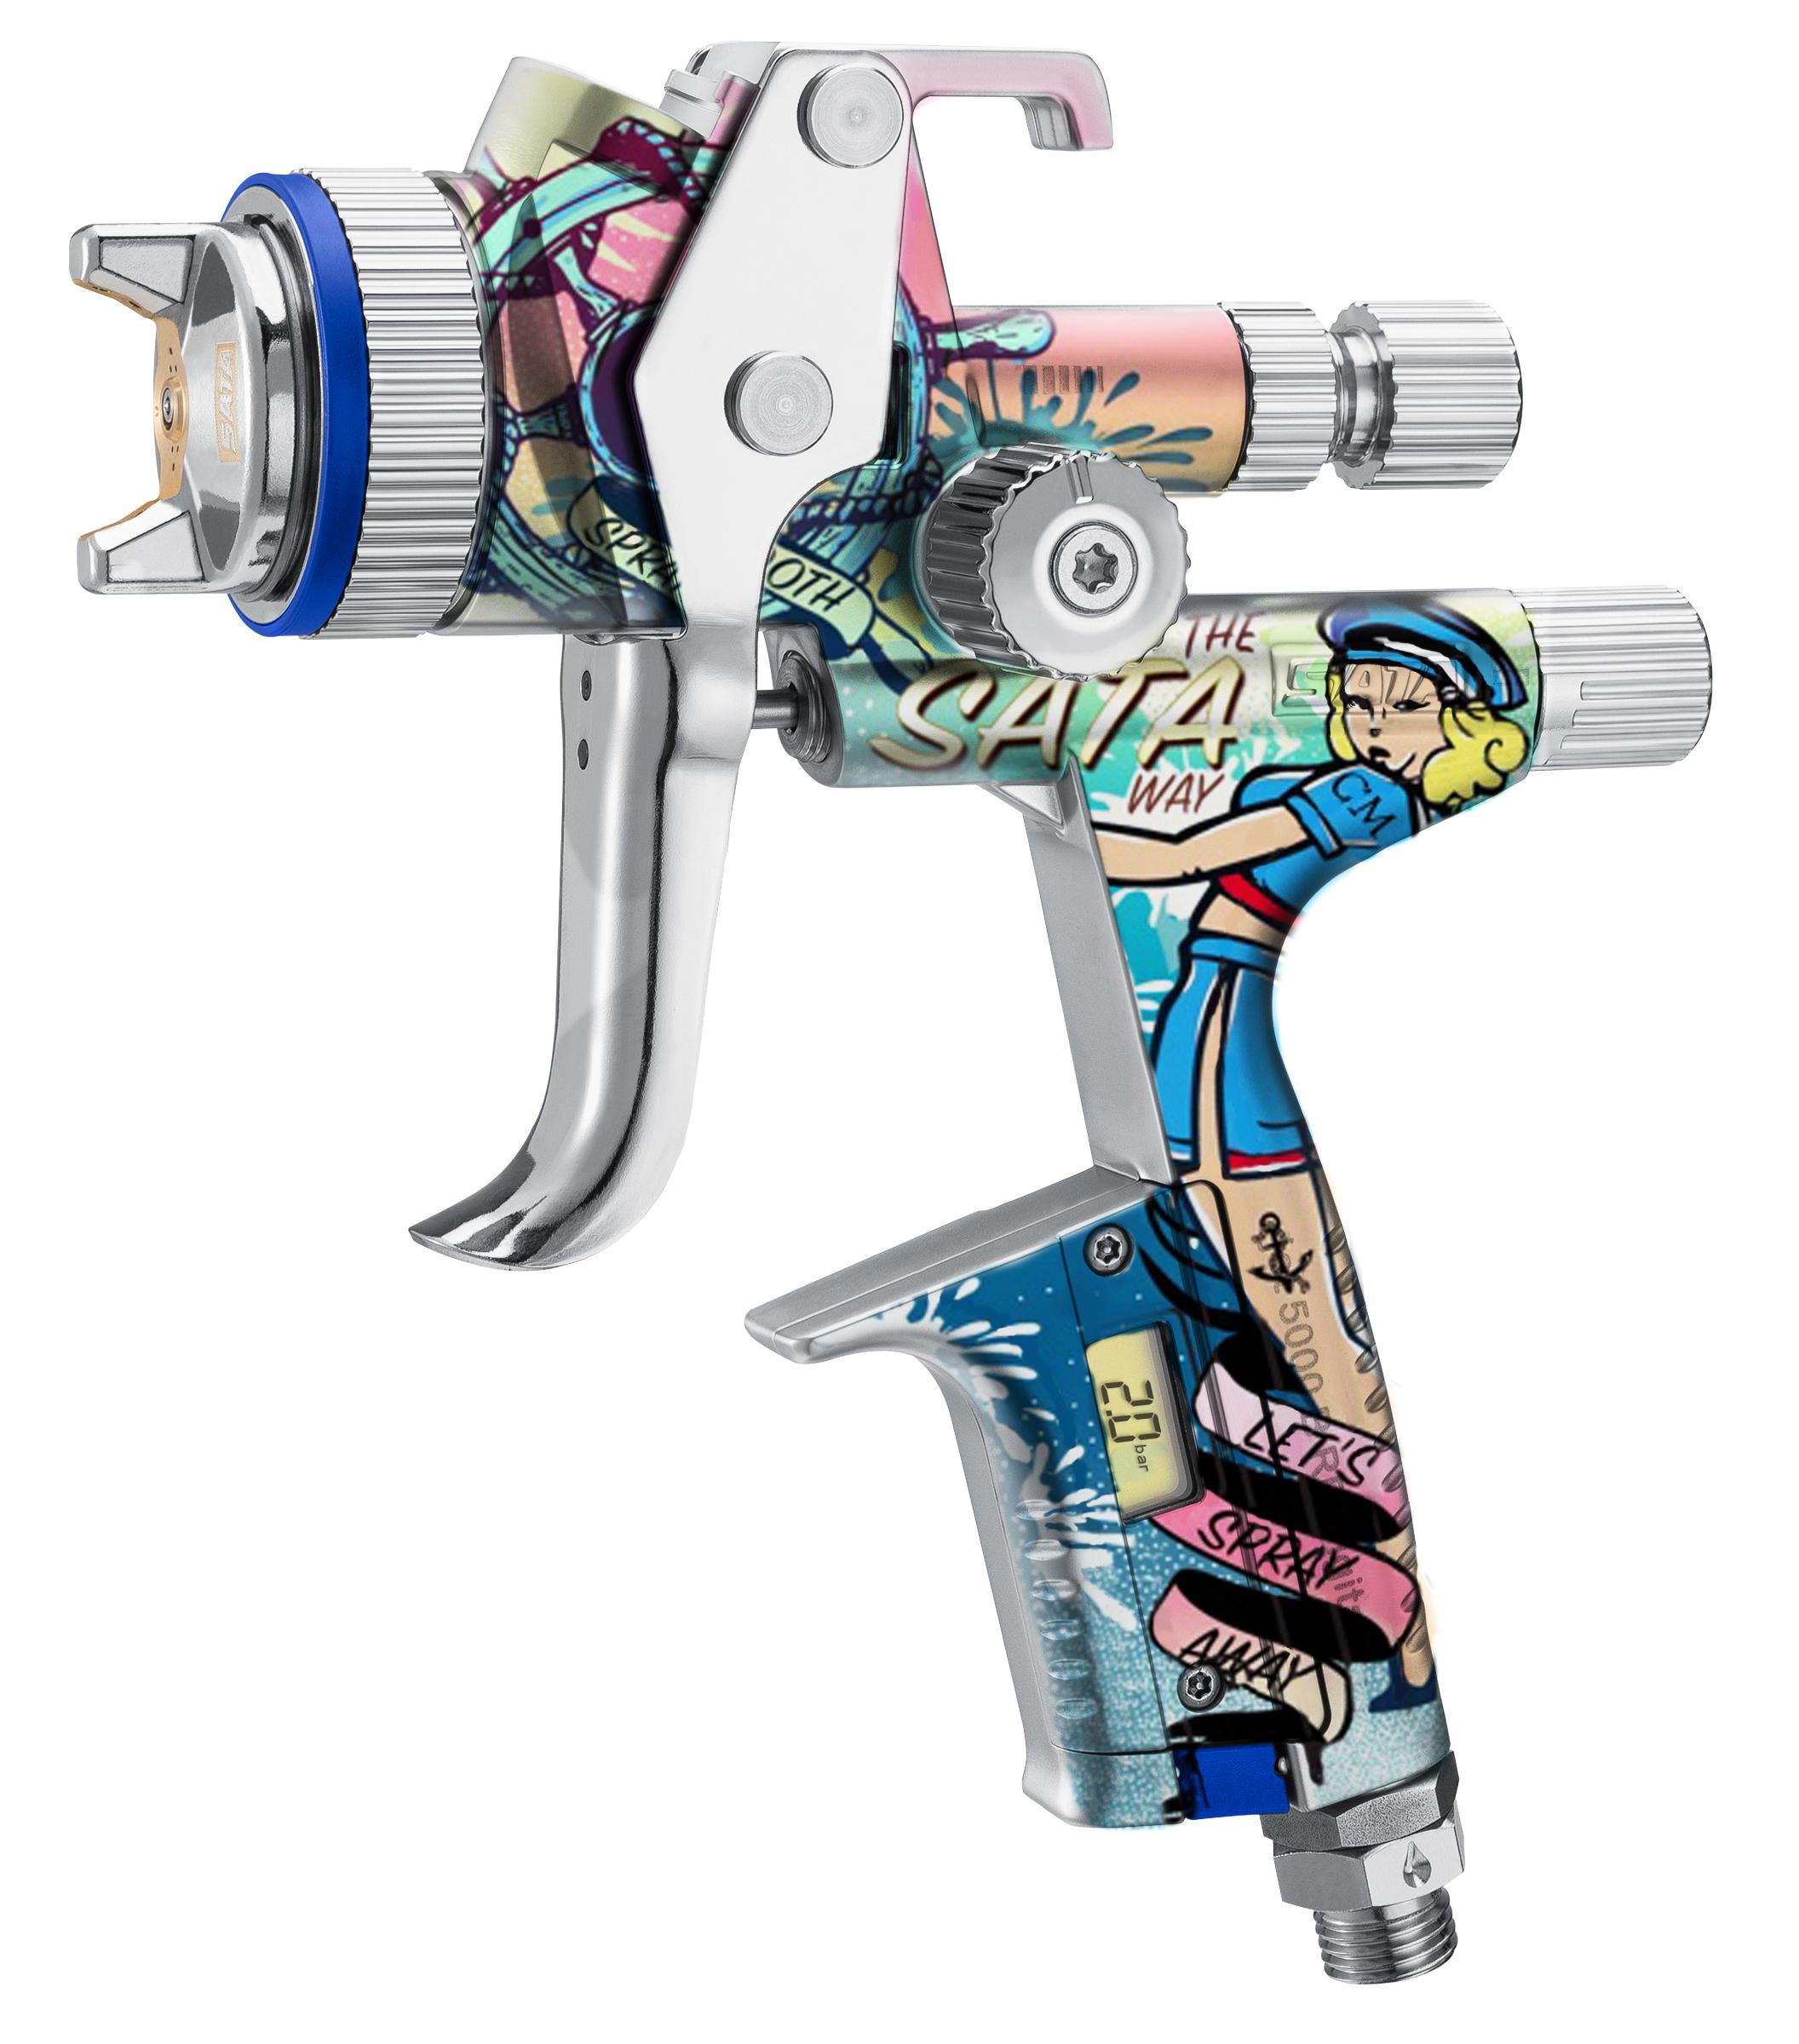 SATAjet 5000 B Sailor - spray away bei Autolack21 - Limitierte Edition